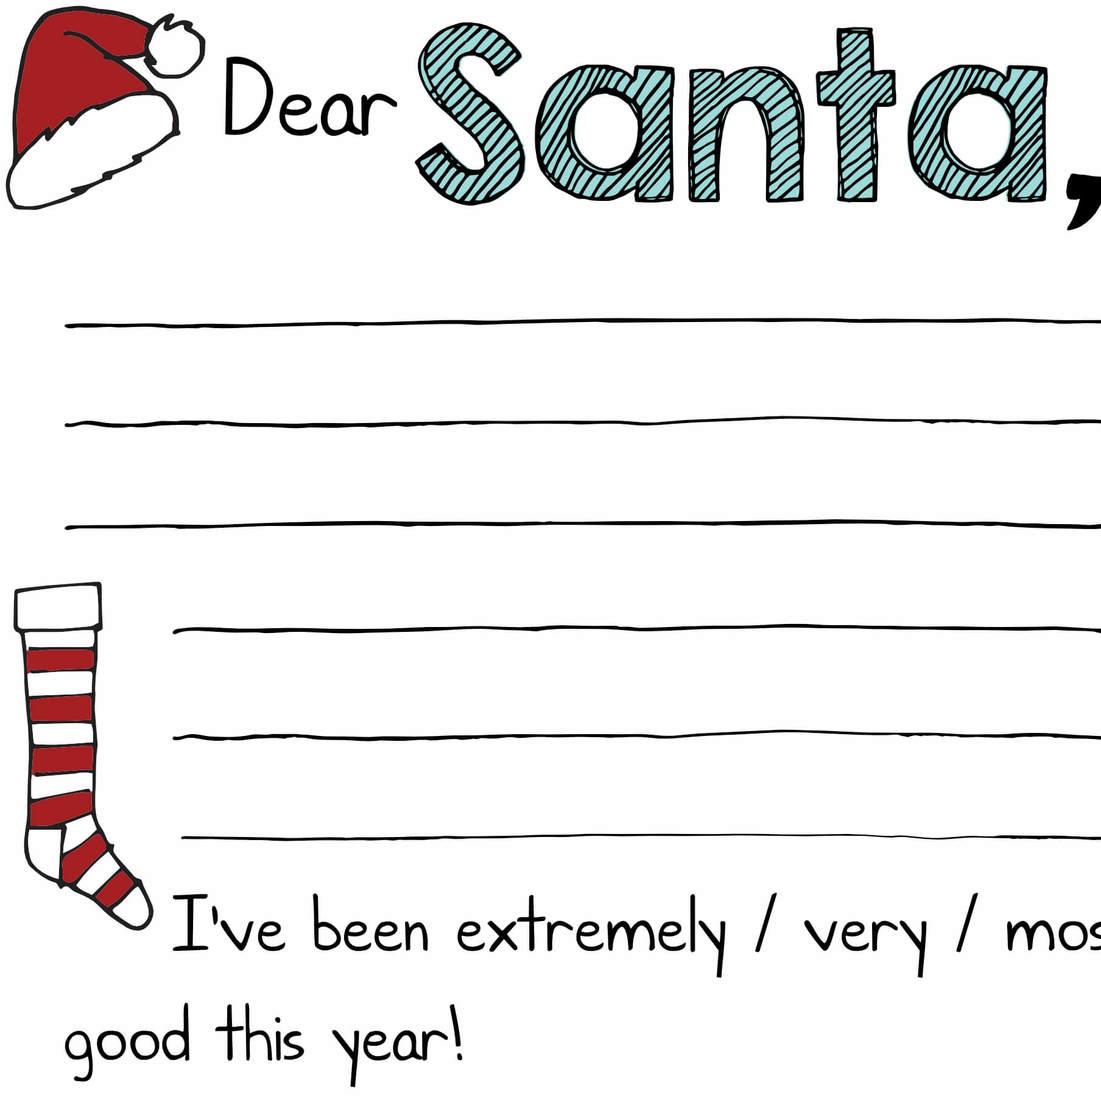 Free Christmas Printables Quot Dear Santa Quot Letters ⋆ Mama Geek